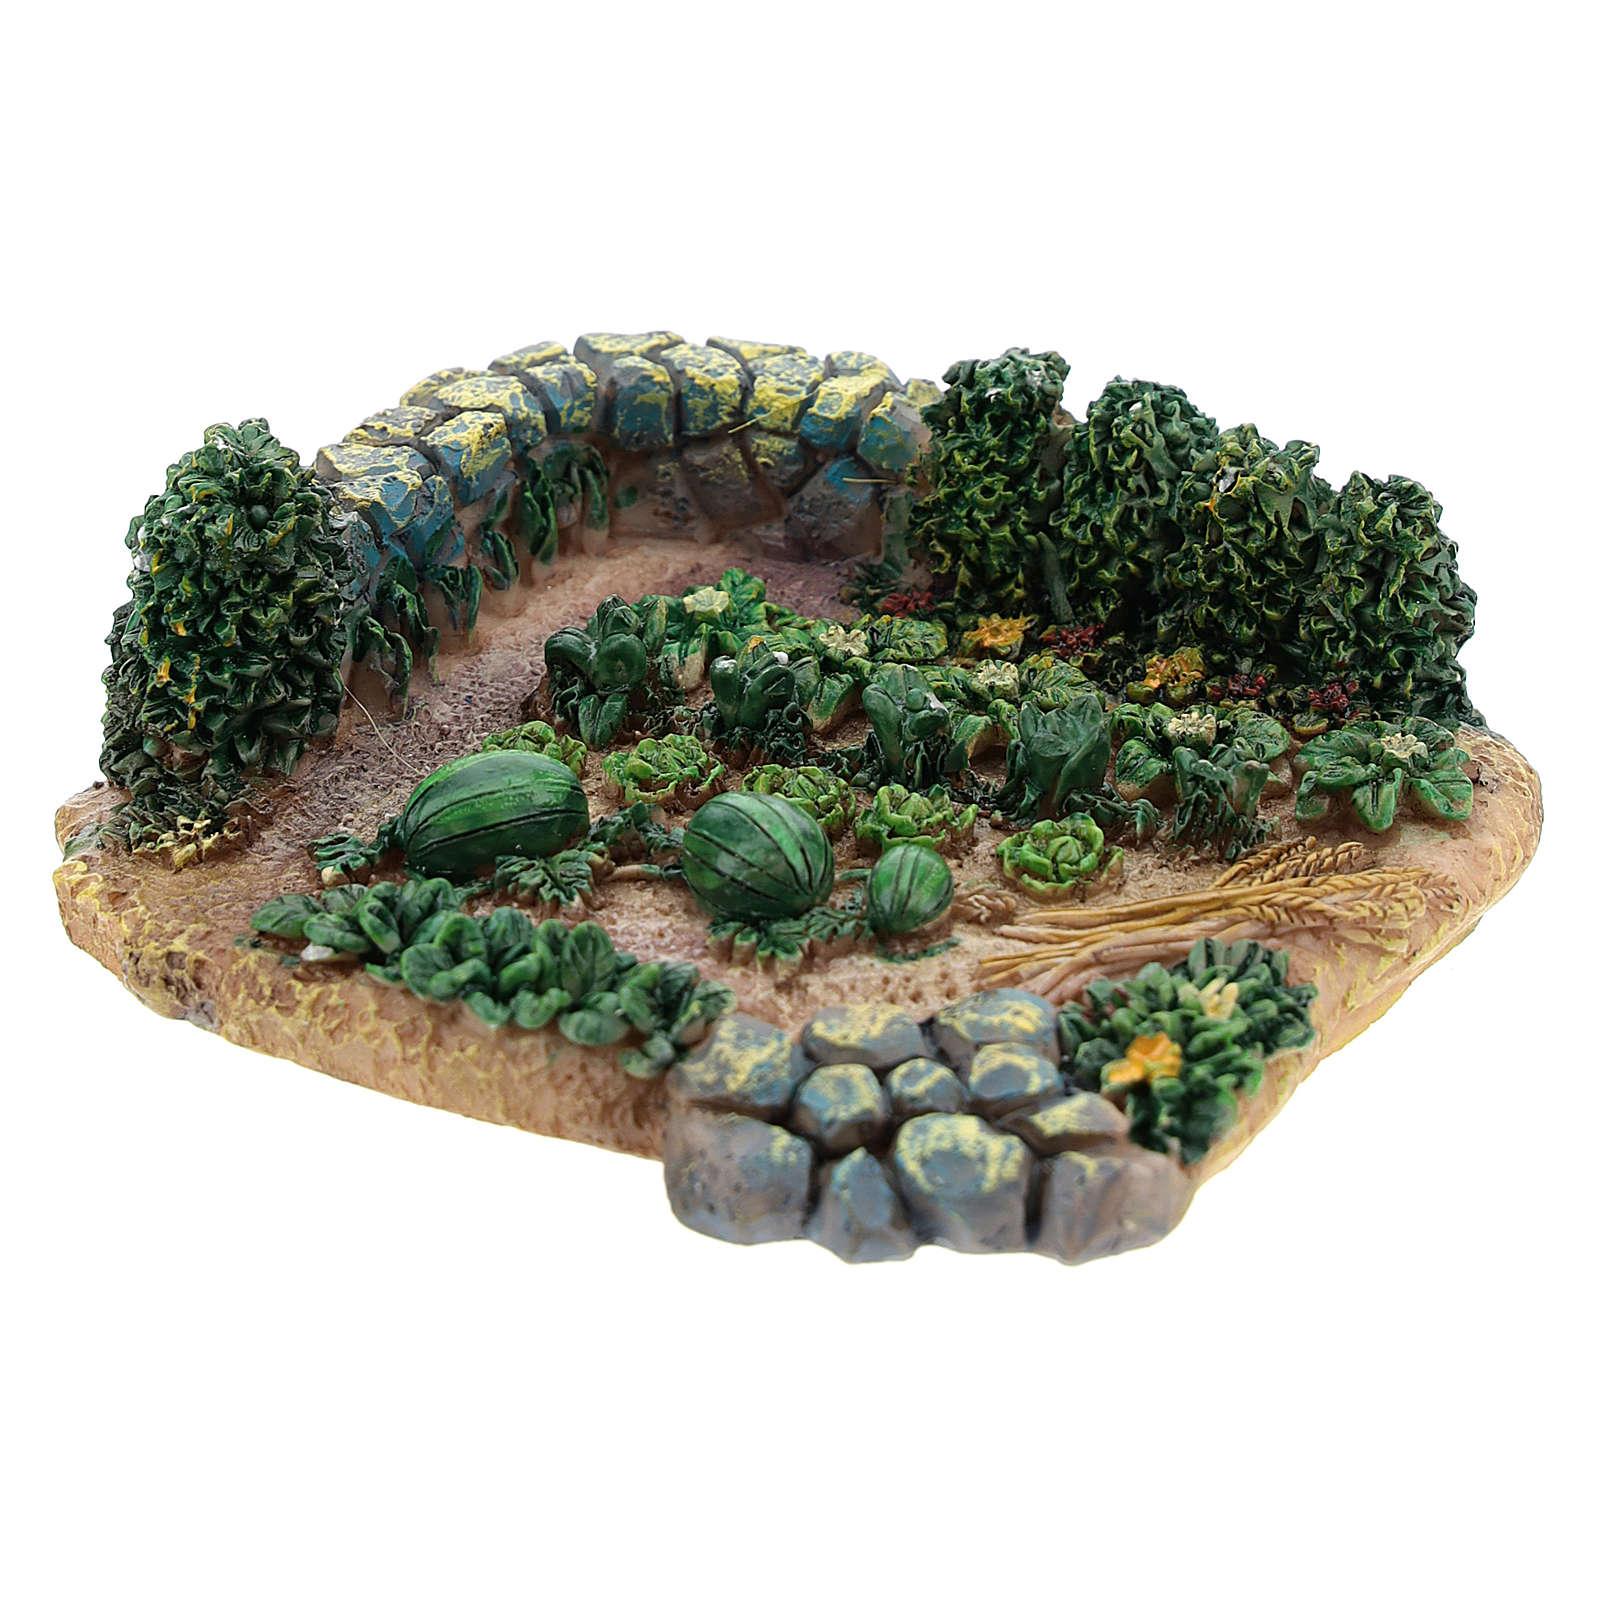 Miniature garden 2x9x9 cm, in resin for 6-8 cm 4